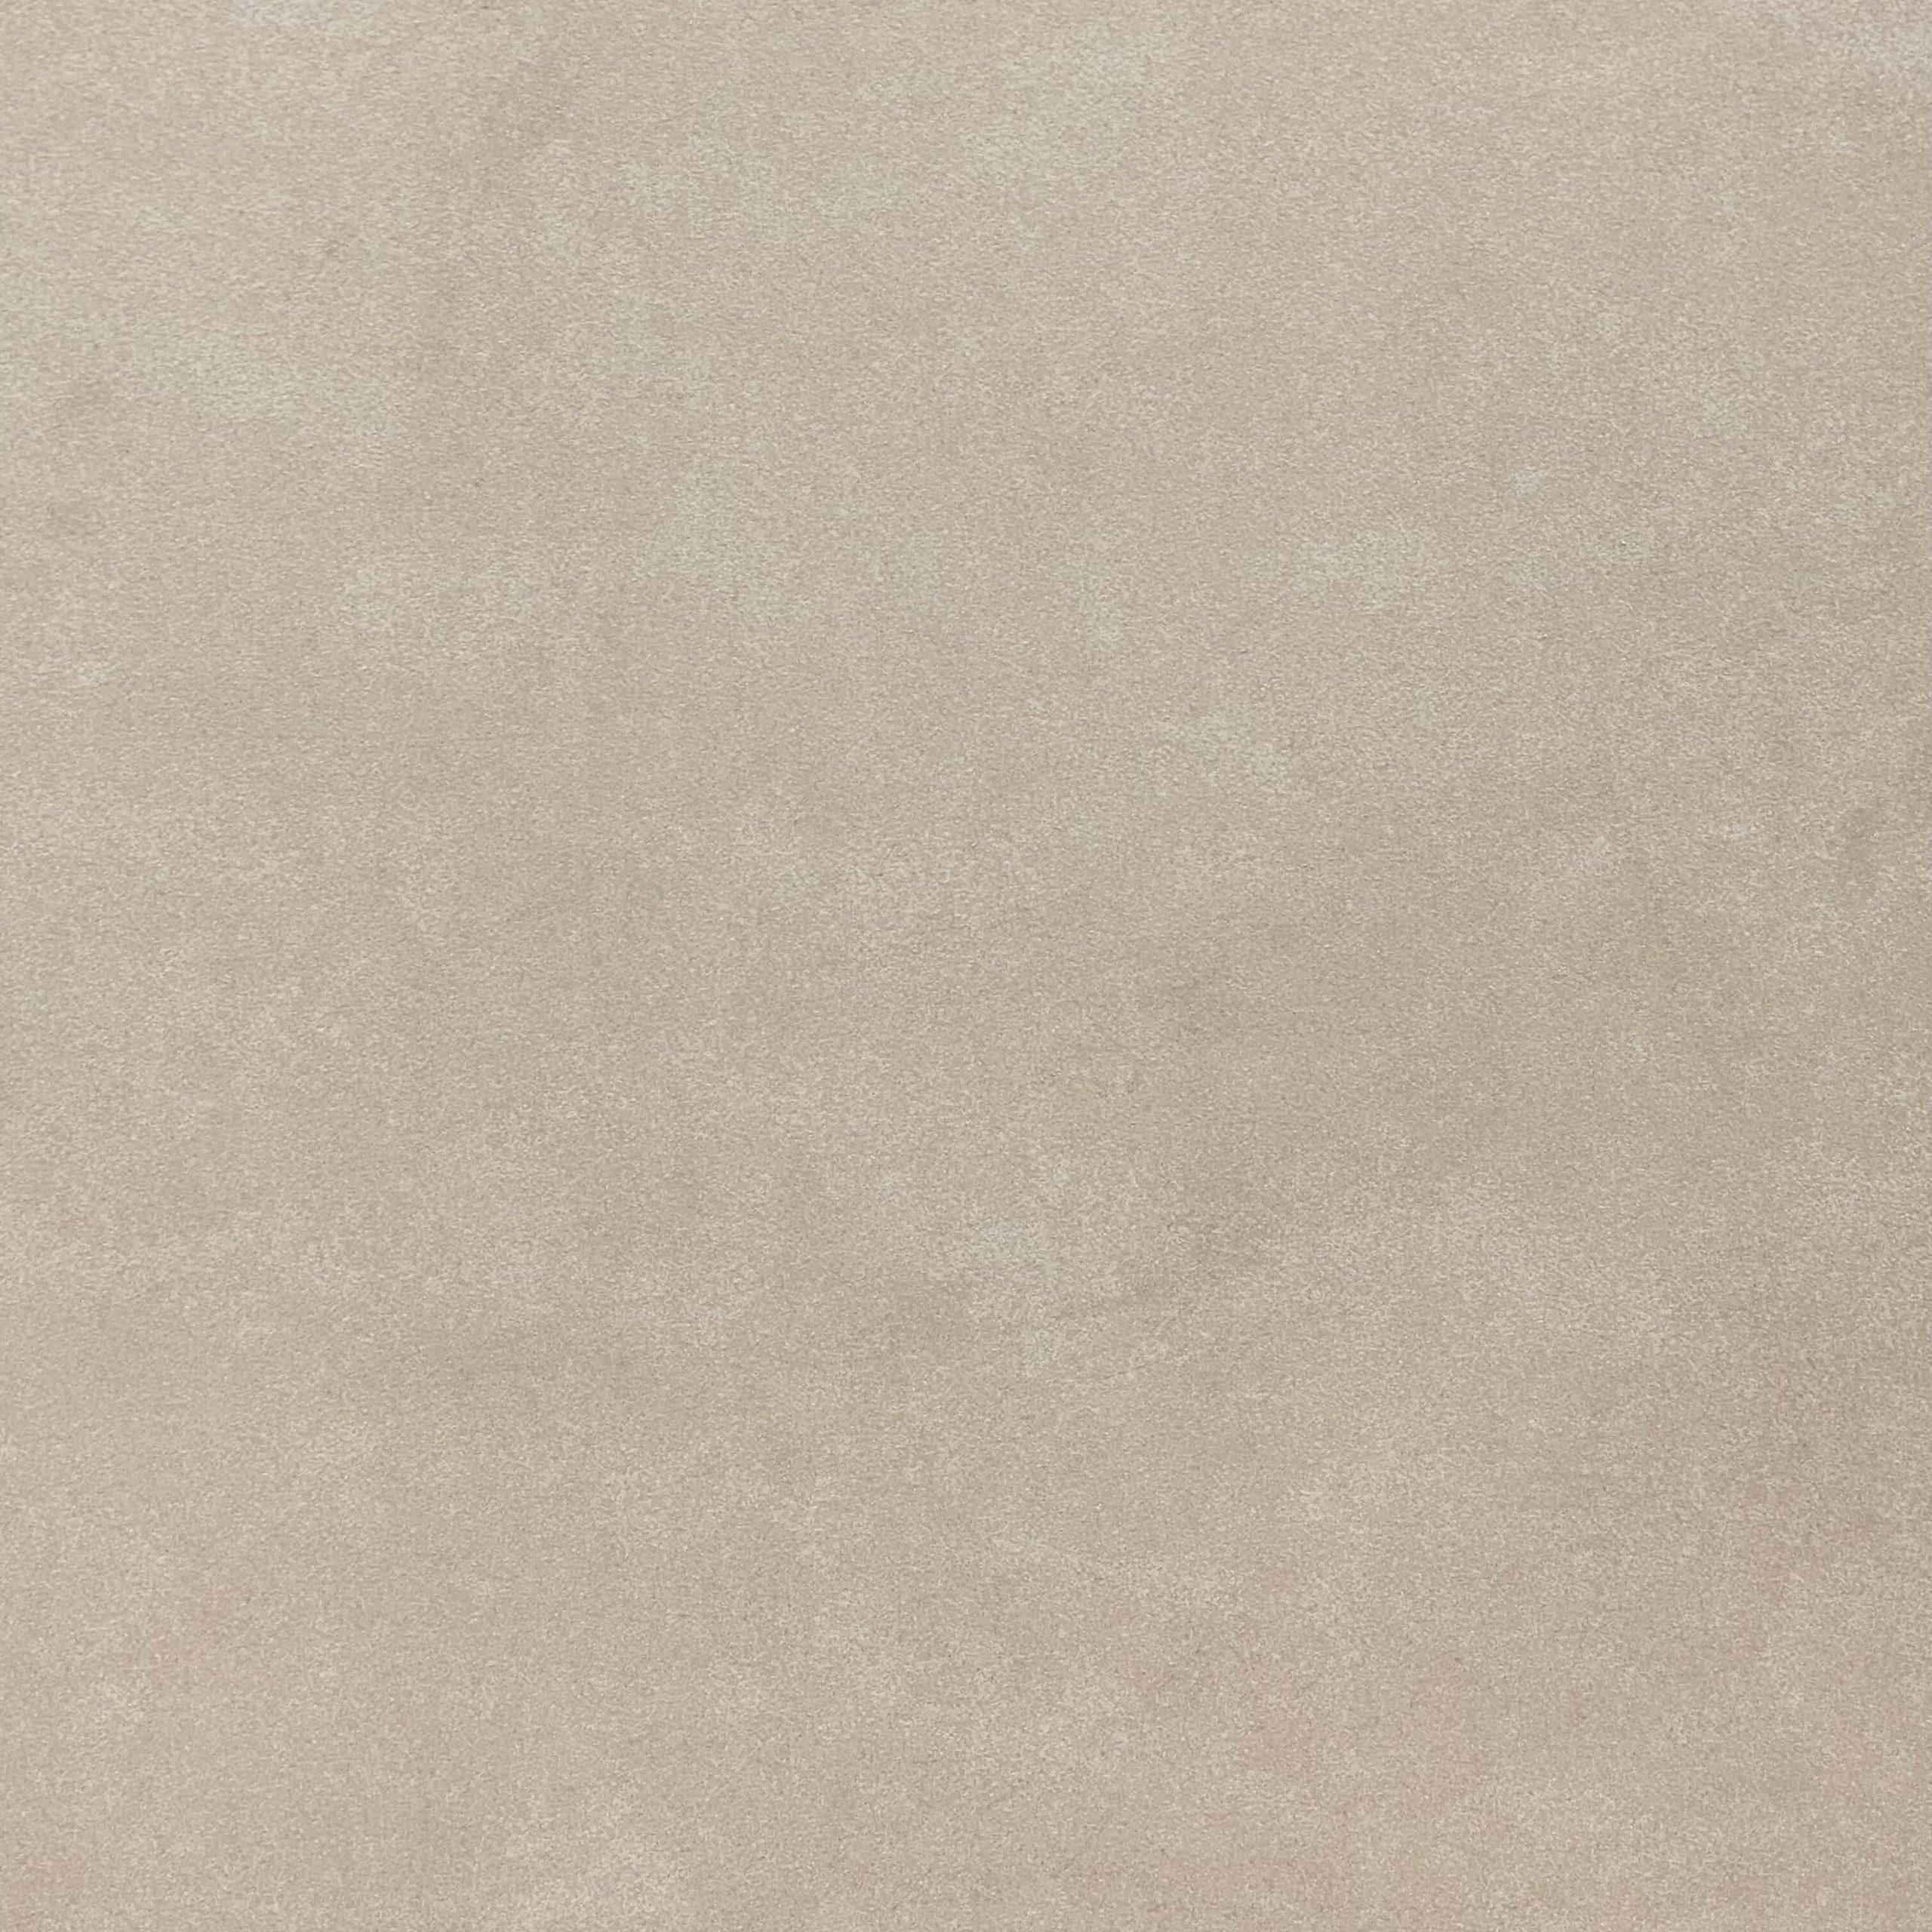 Crema Perla Rectified Anti Slip Porcelain Paver 3789